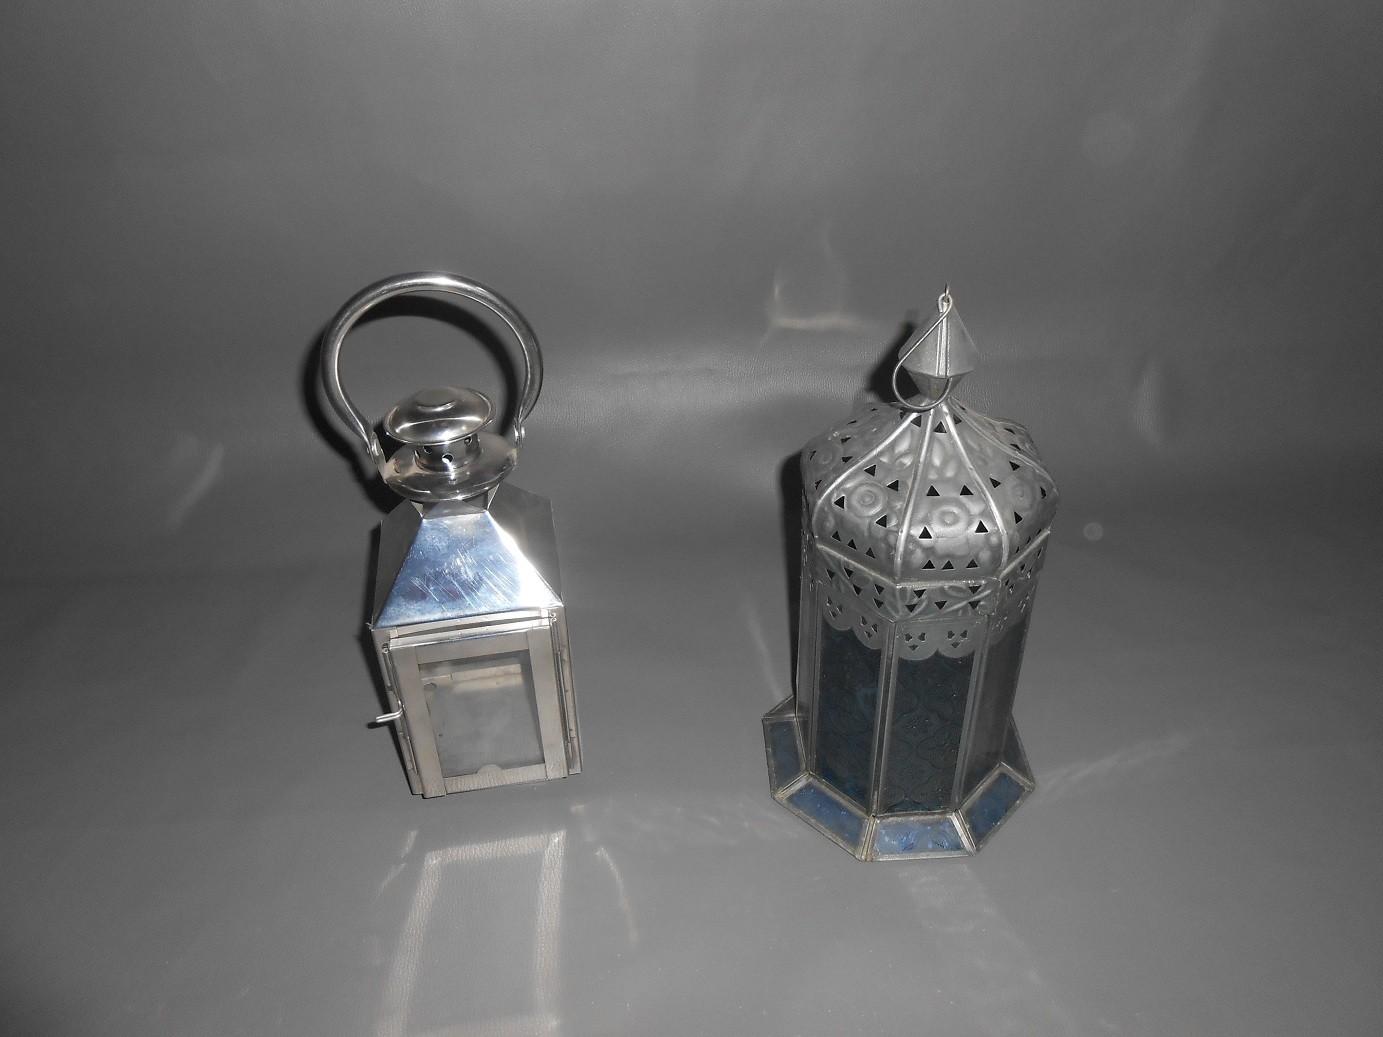 Traditional Iron Lanterns